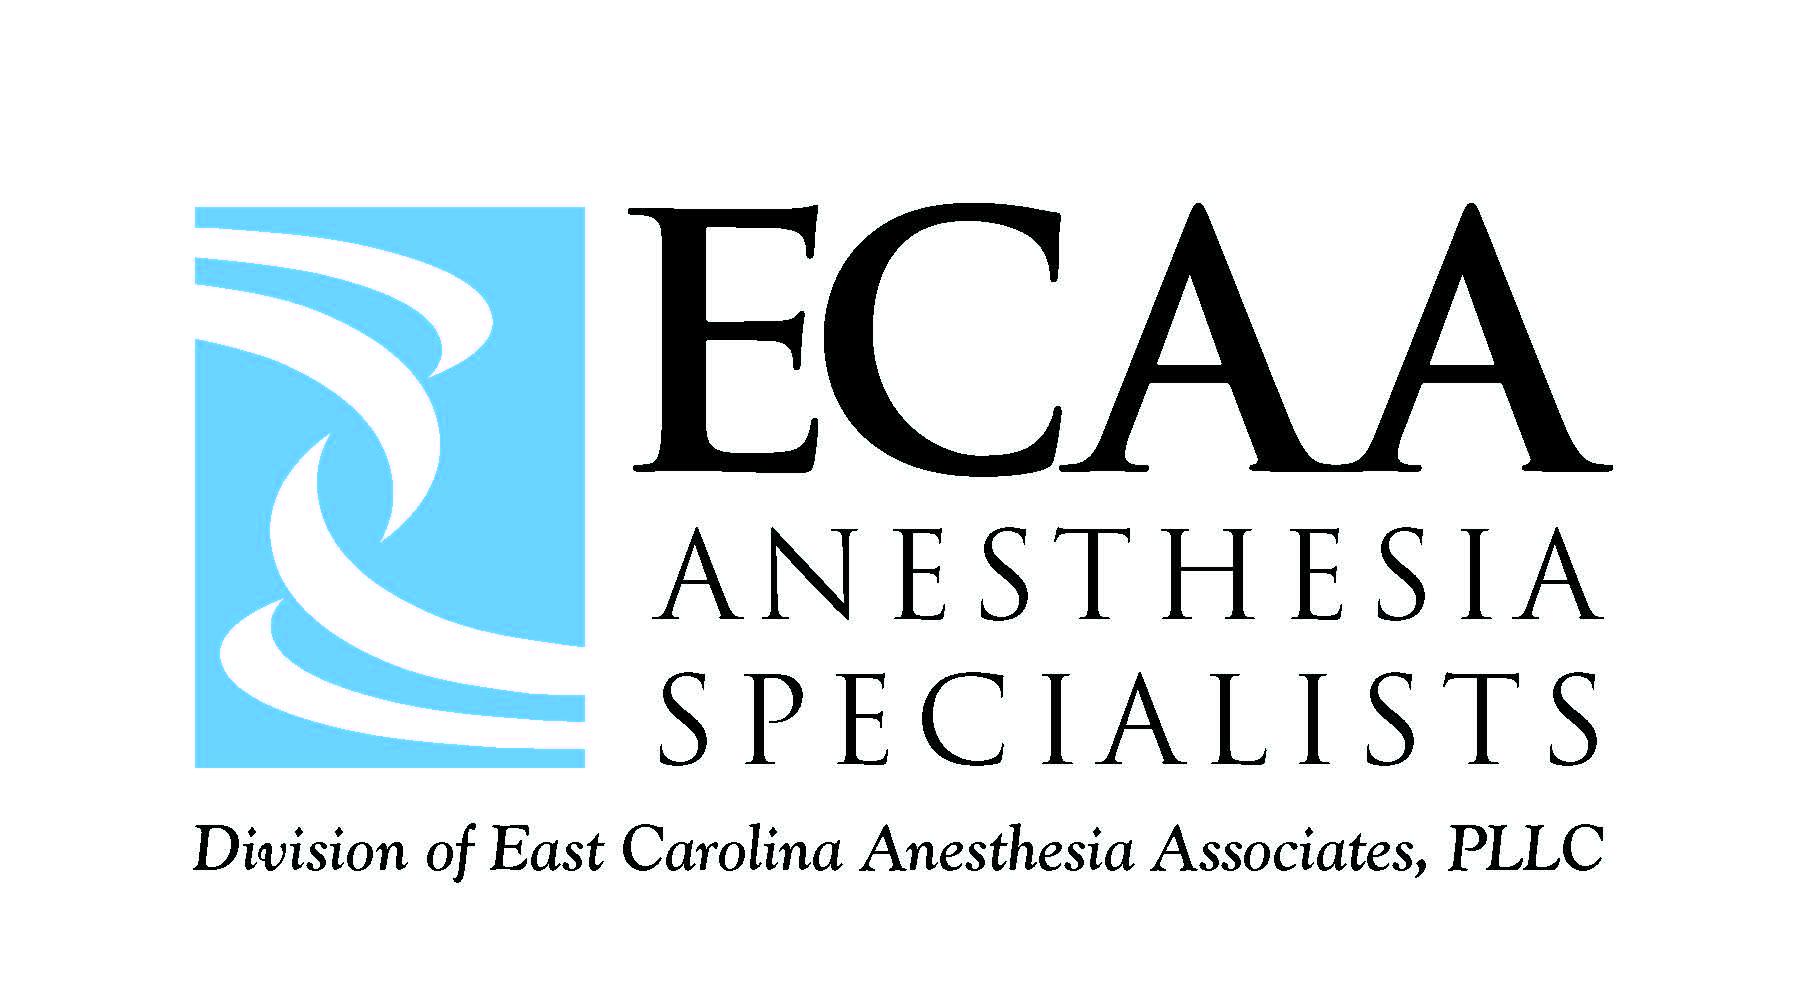 ECAA - Anesthesia Specialists Logo